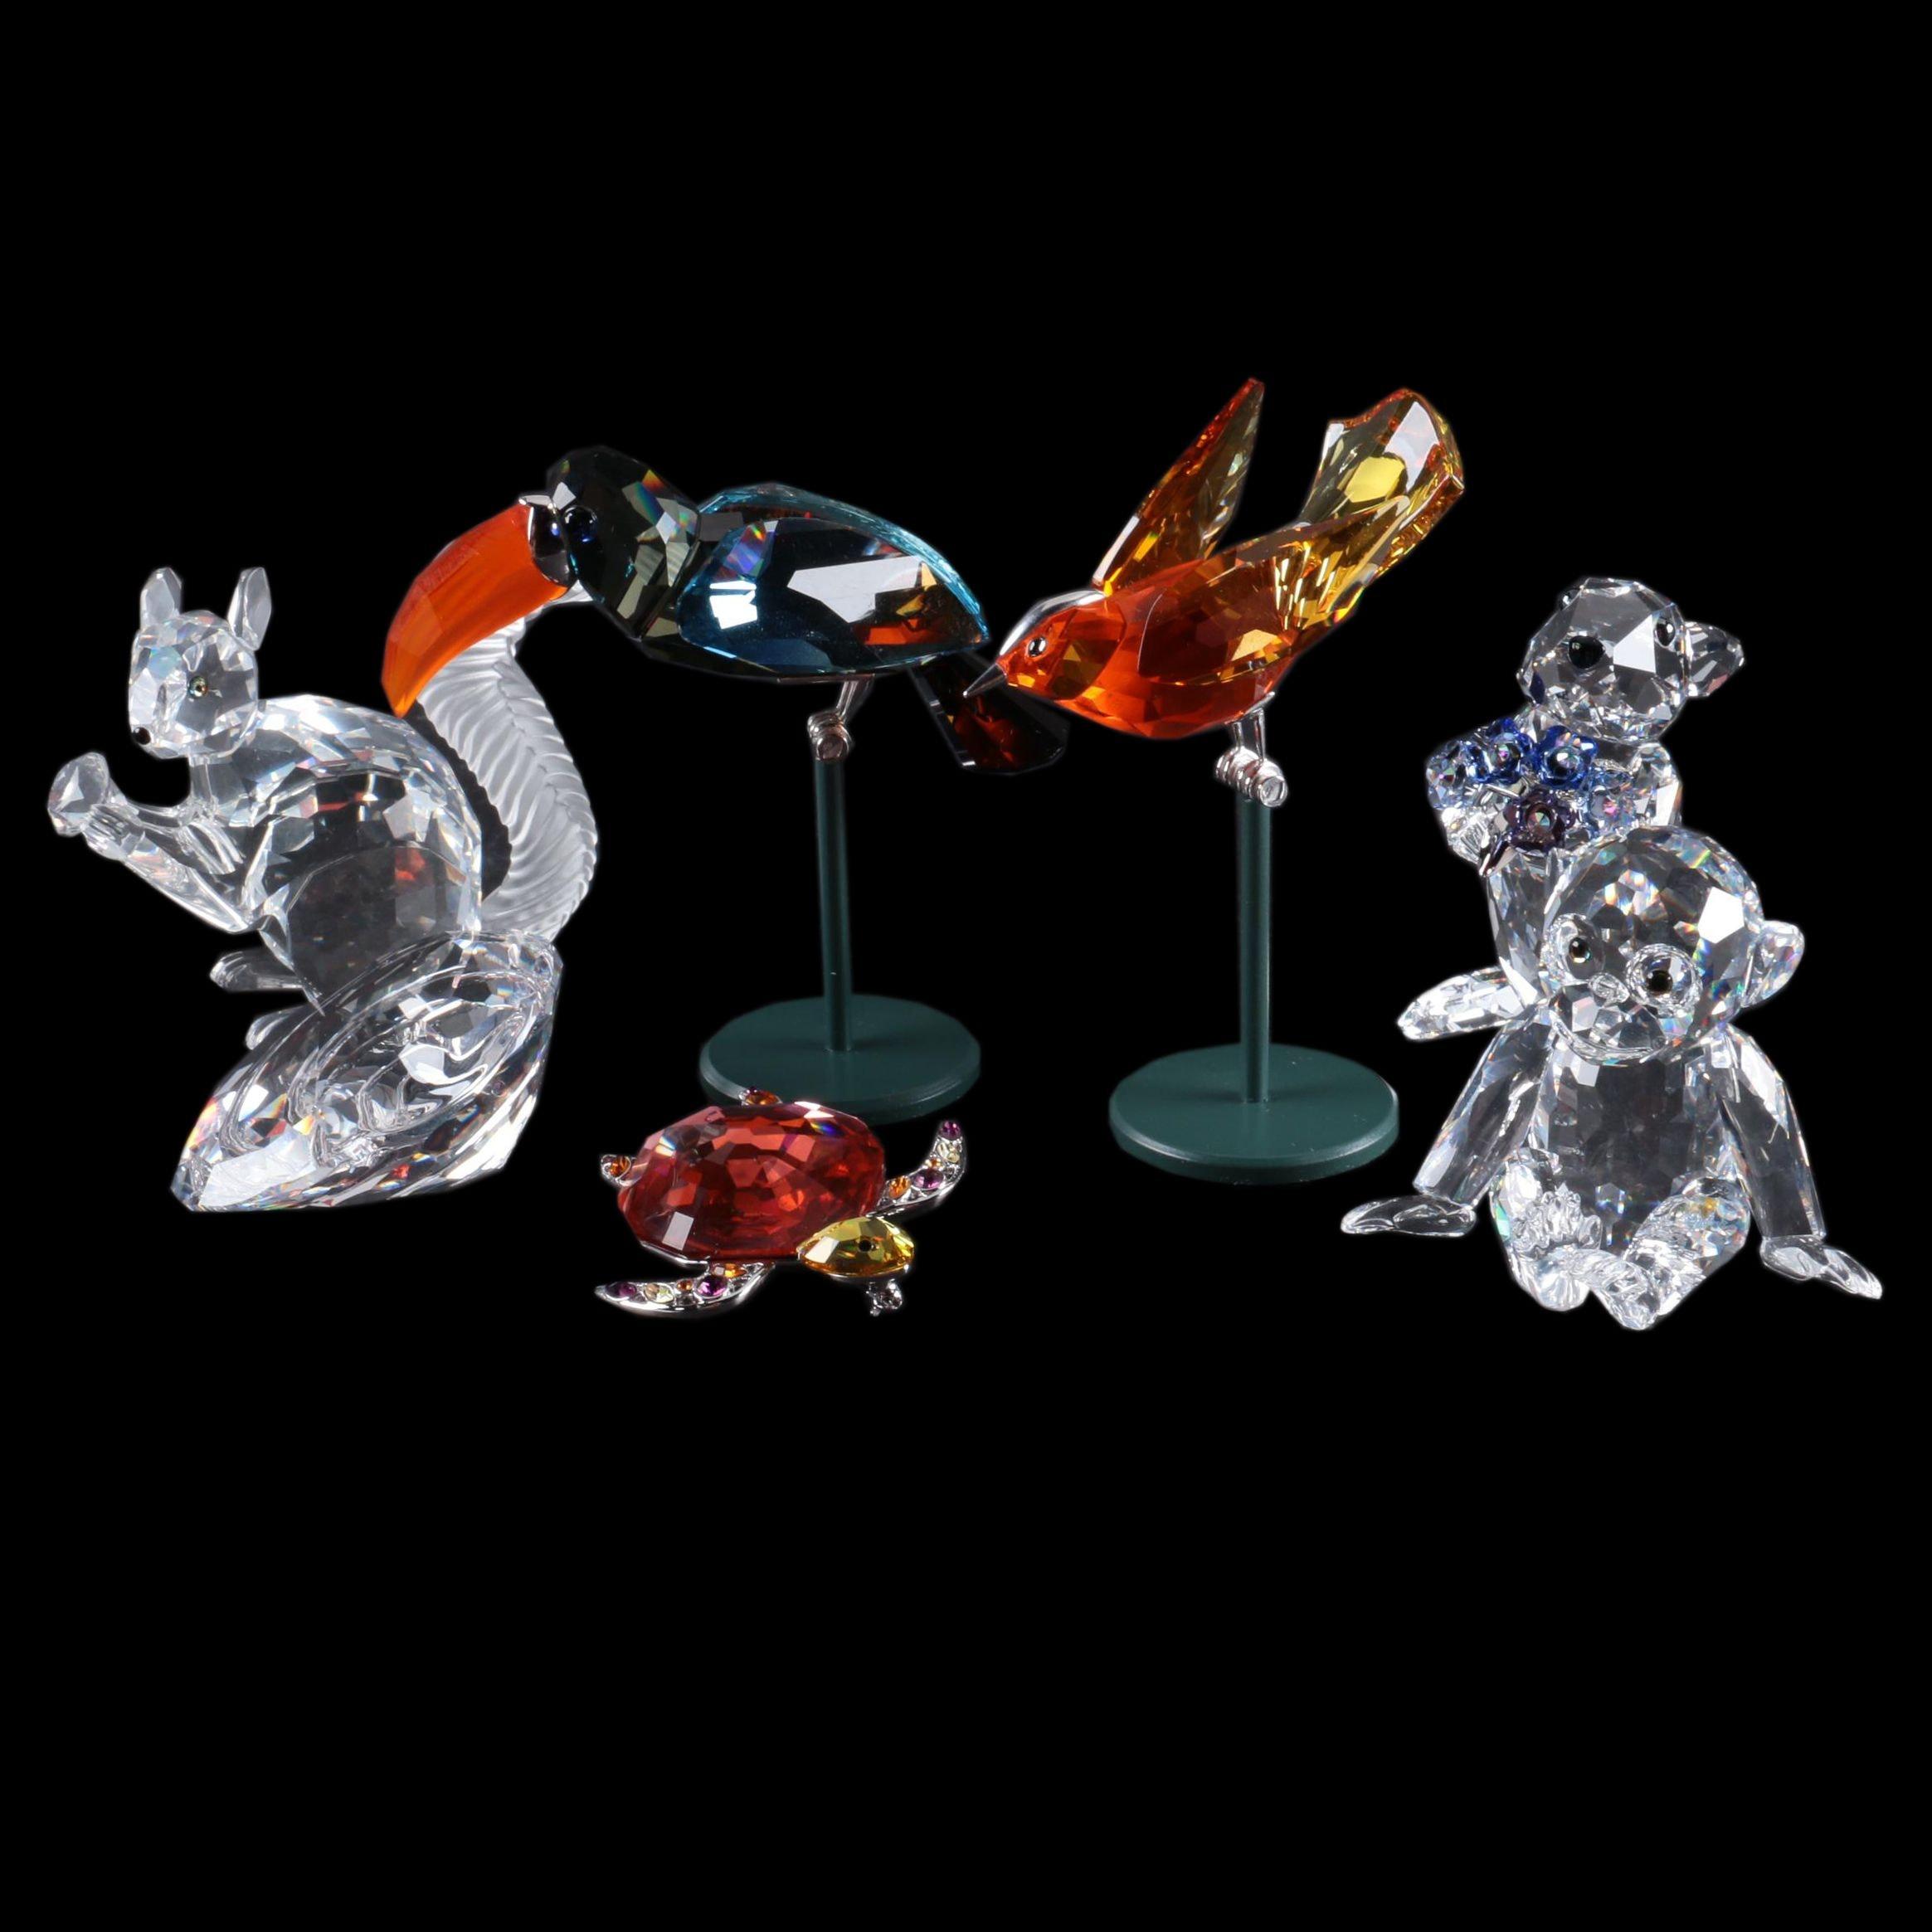 Swarovski Crystal Animal Figurines